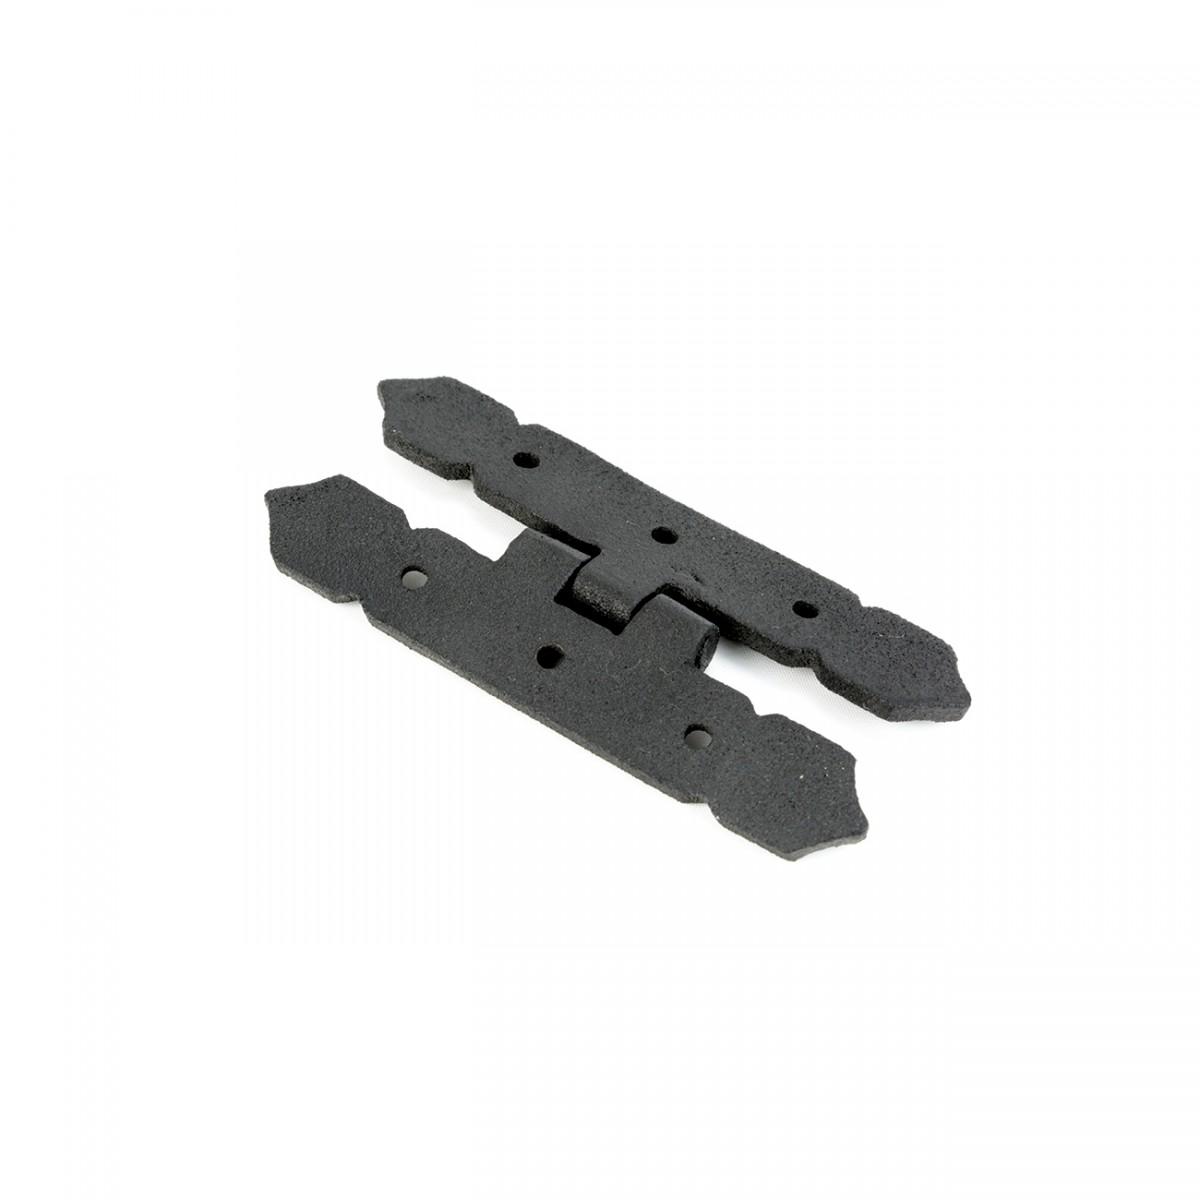 Cabinet H Hinge Black Iron Spear Tip 4 H Screws Included Black Iron Spear Tip Hinge 4 H Hinge Cabinet Hardware Wrought Iron Cabinet Hinge